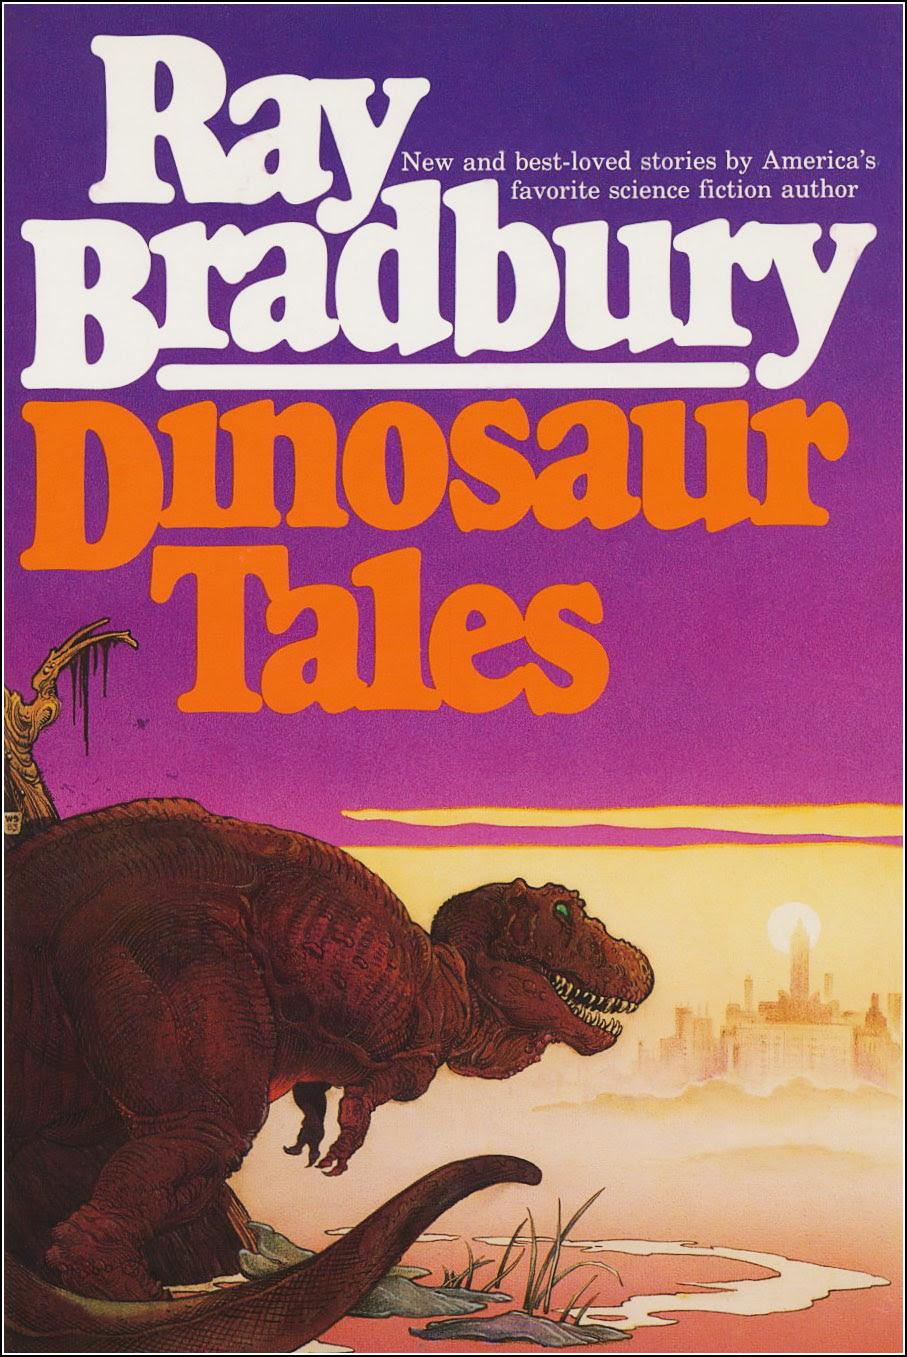 William Stout, Dinosaur Tales